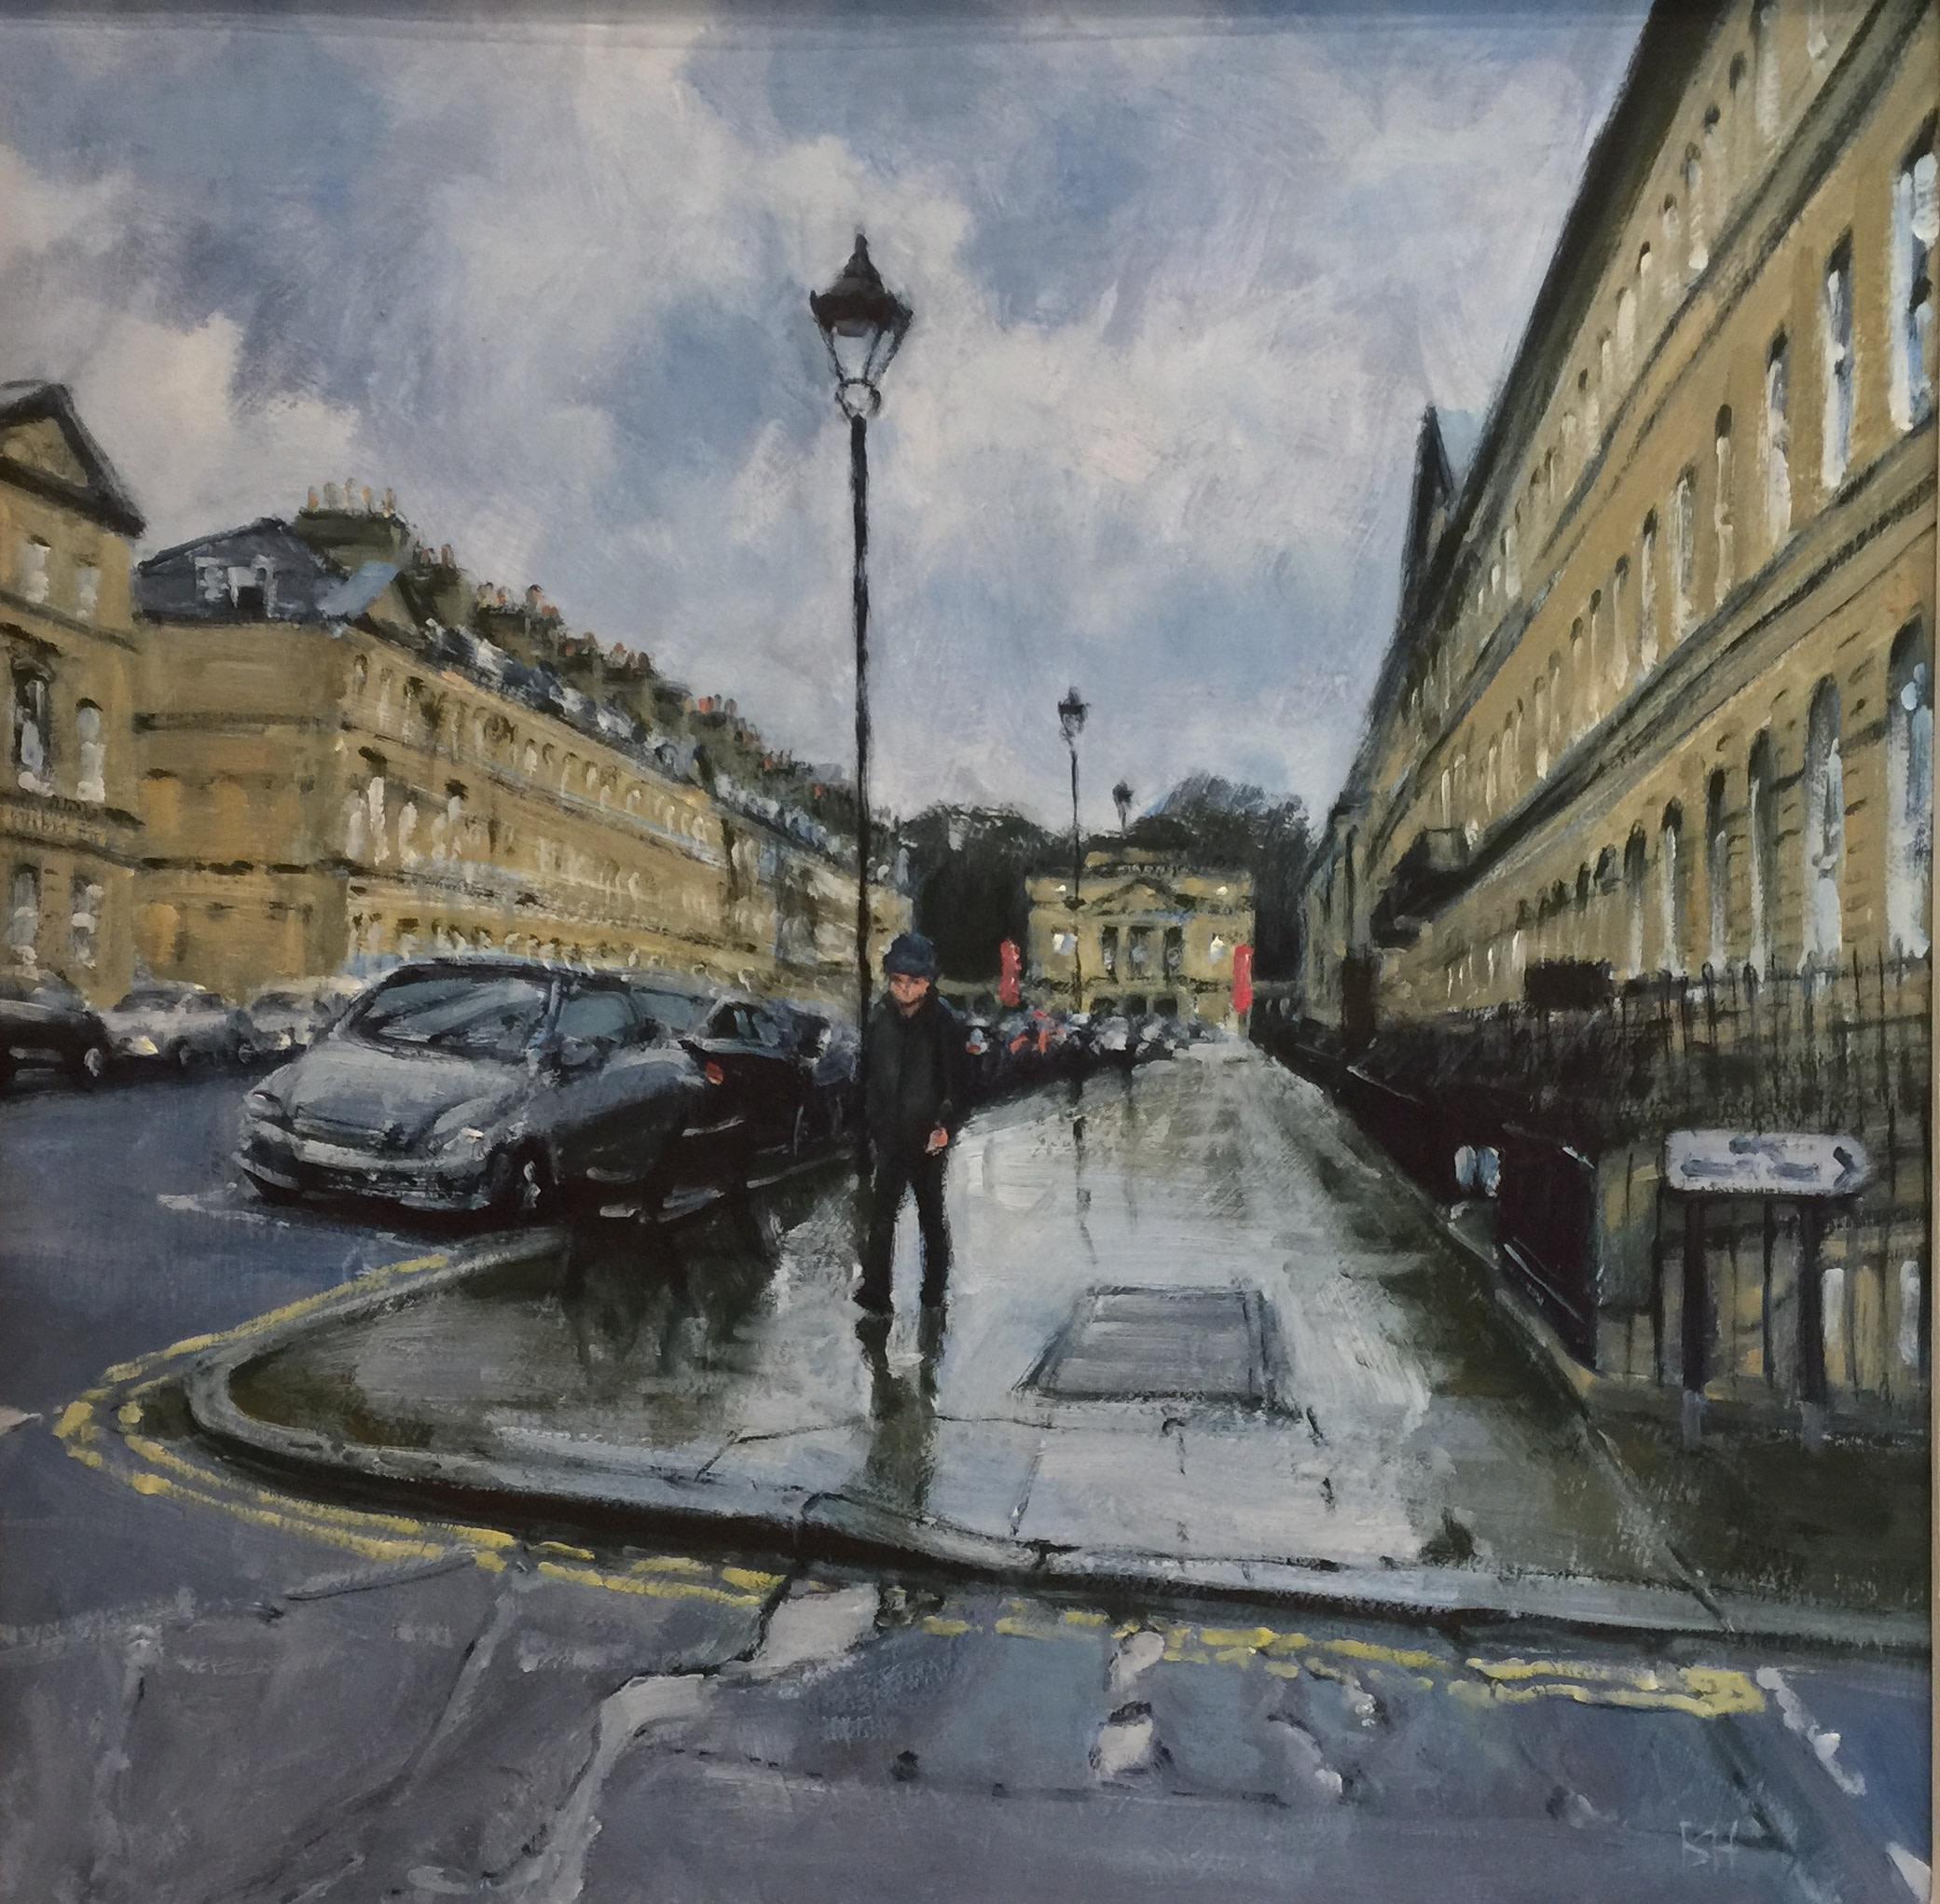 <span class=&#34;link fancybox-details-link&#34;><a href=&#34;/artists/181-ben-hughes/works/2773-ben-hughes-towards-the-holburne/&#34;>View Detail Page</a></span><div class=&#34;artist&#34;><strong>Ben Hughes</strong></div> <div class=&#34;title&#34;><em>Towards the Holburne</em></div> <div class=&#34;medium&#34;>Oil on Board</div> <div class=&#34;dimensions&#34;>30 x 30 cm </div><div class=&#34;price&#34;>£550.00</div><div class=&#34;copyright_line&#34;>Copyright The Artist</div>